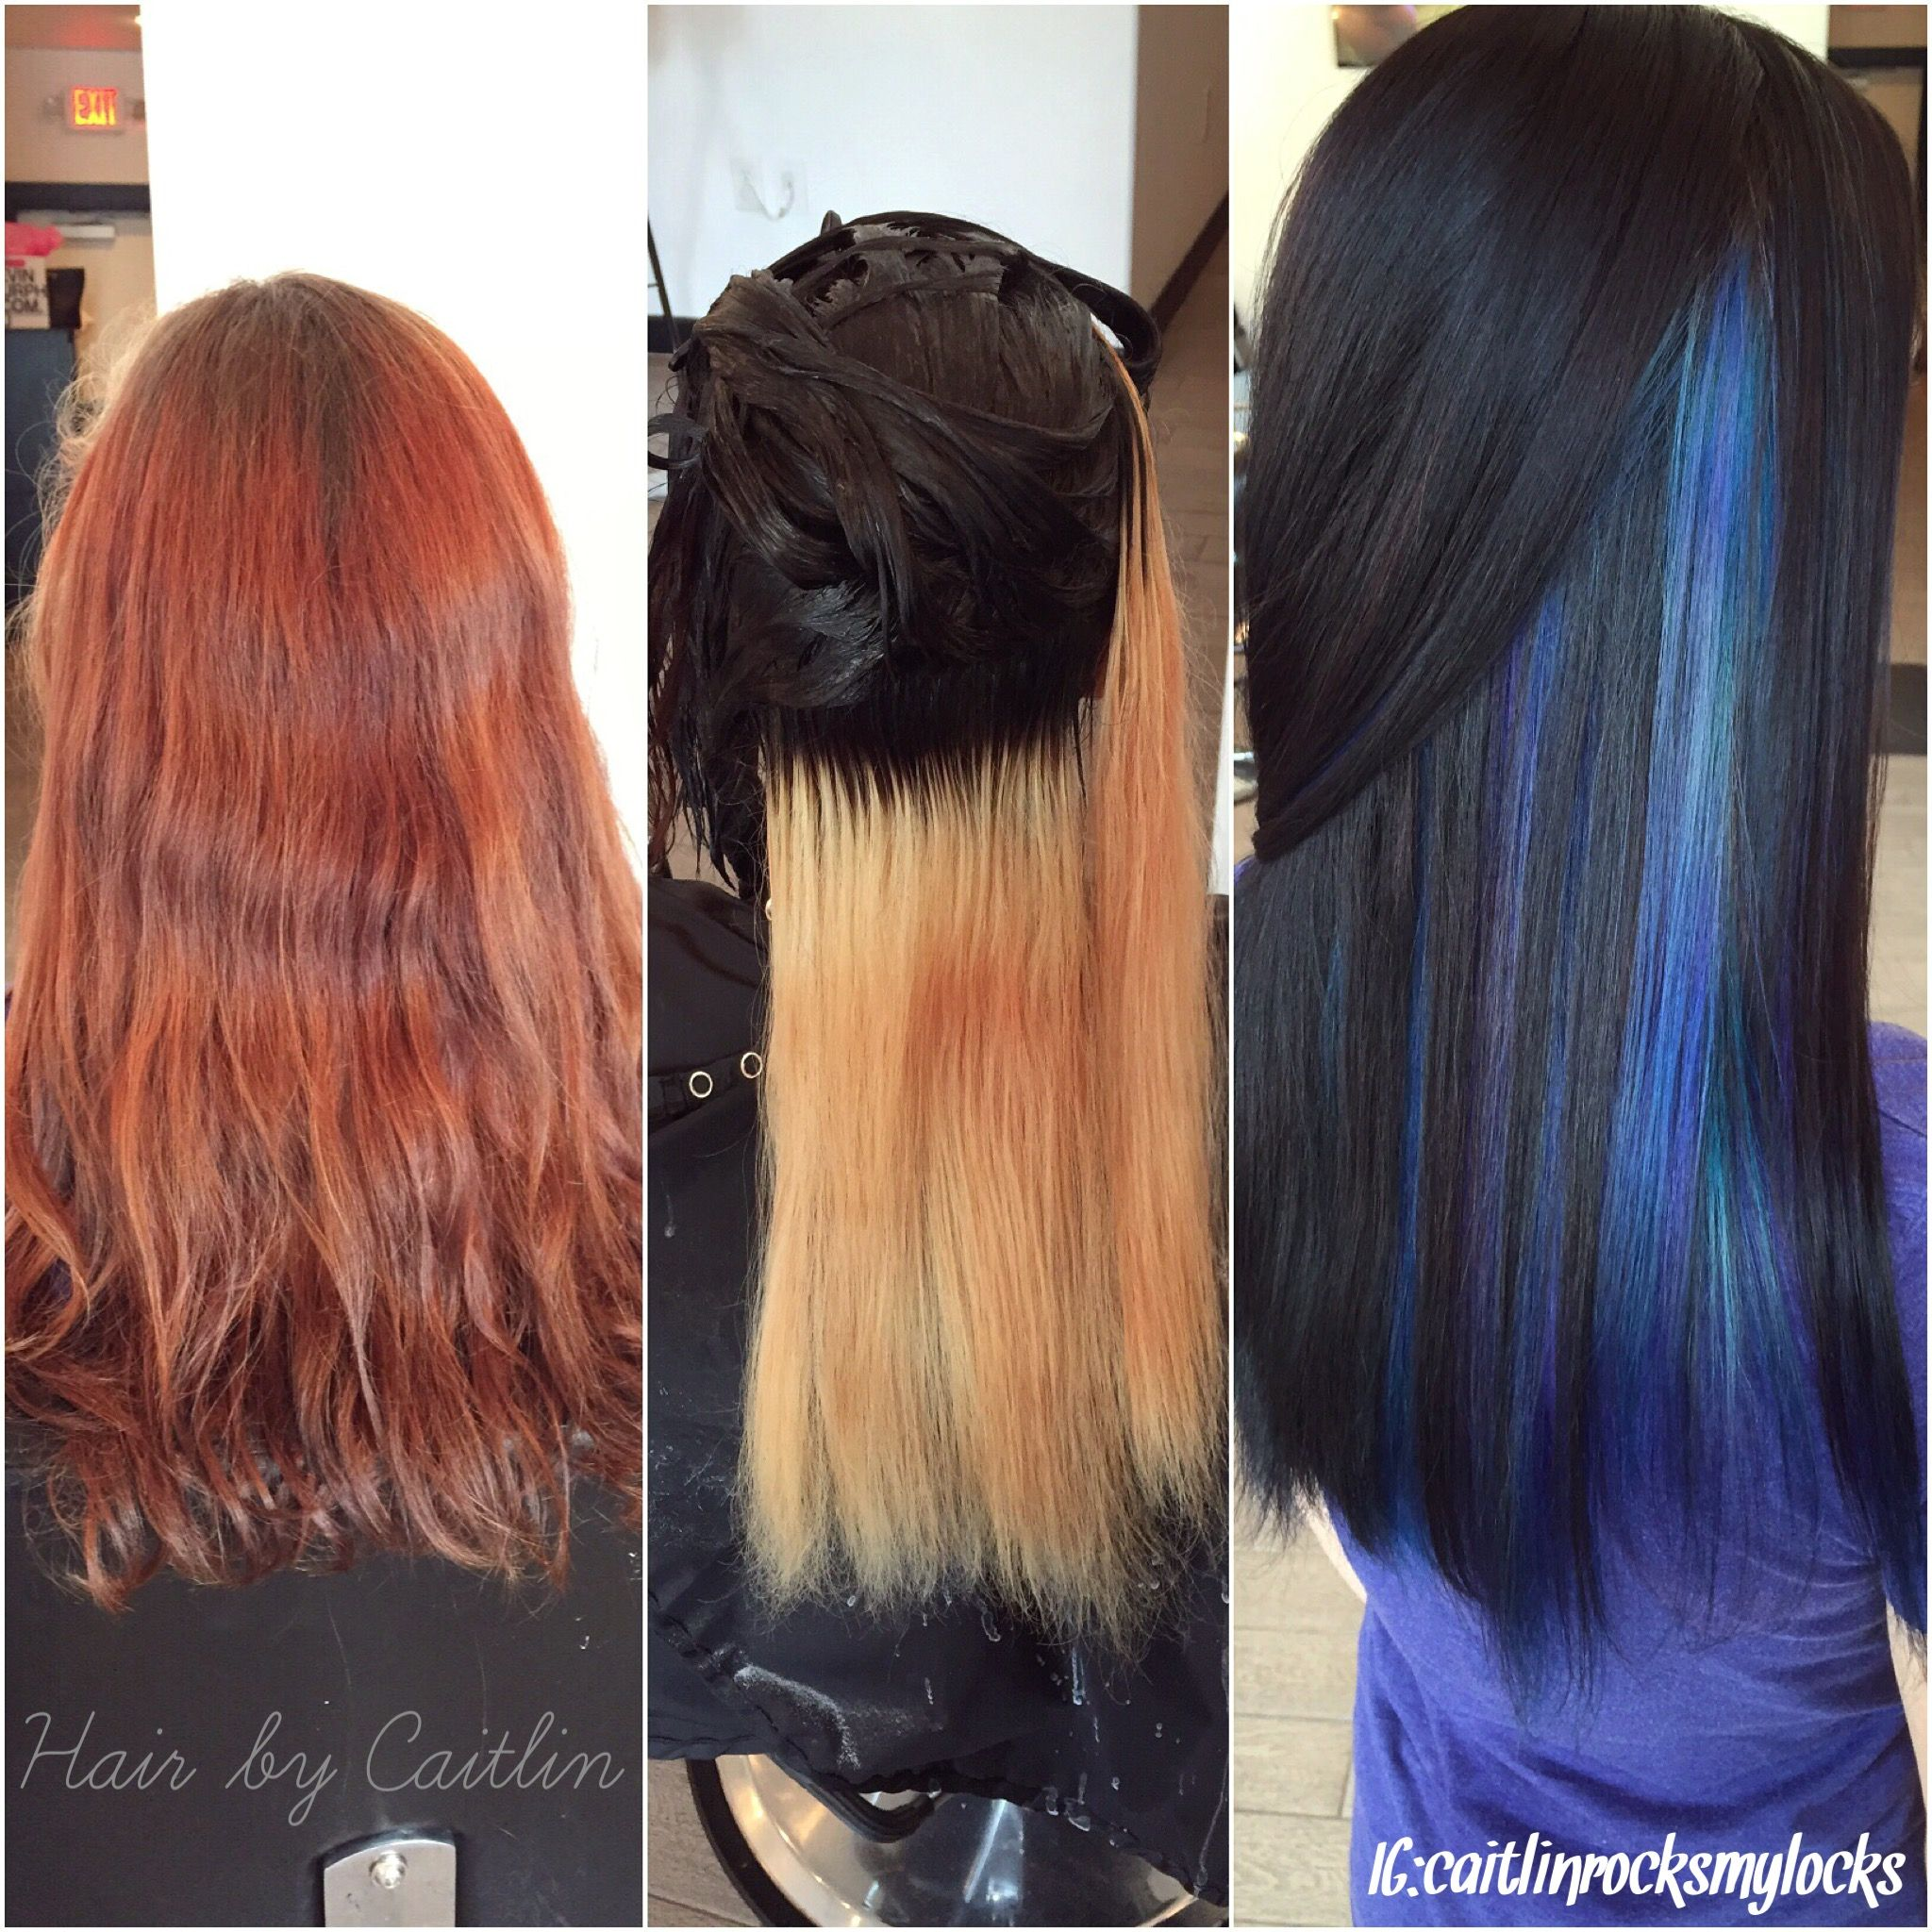 Northern Lights Hair Salon